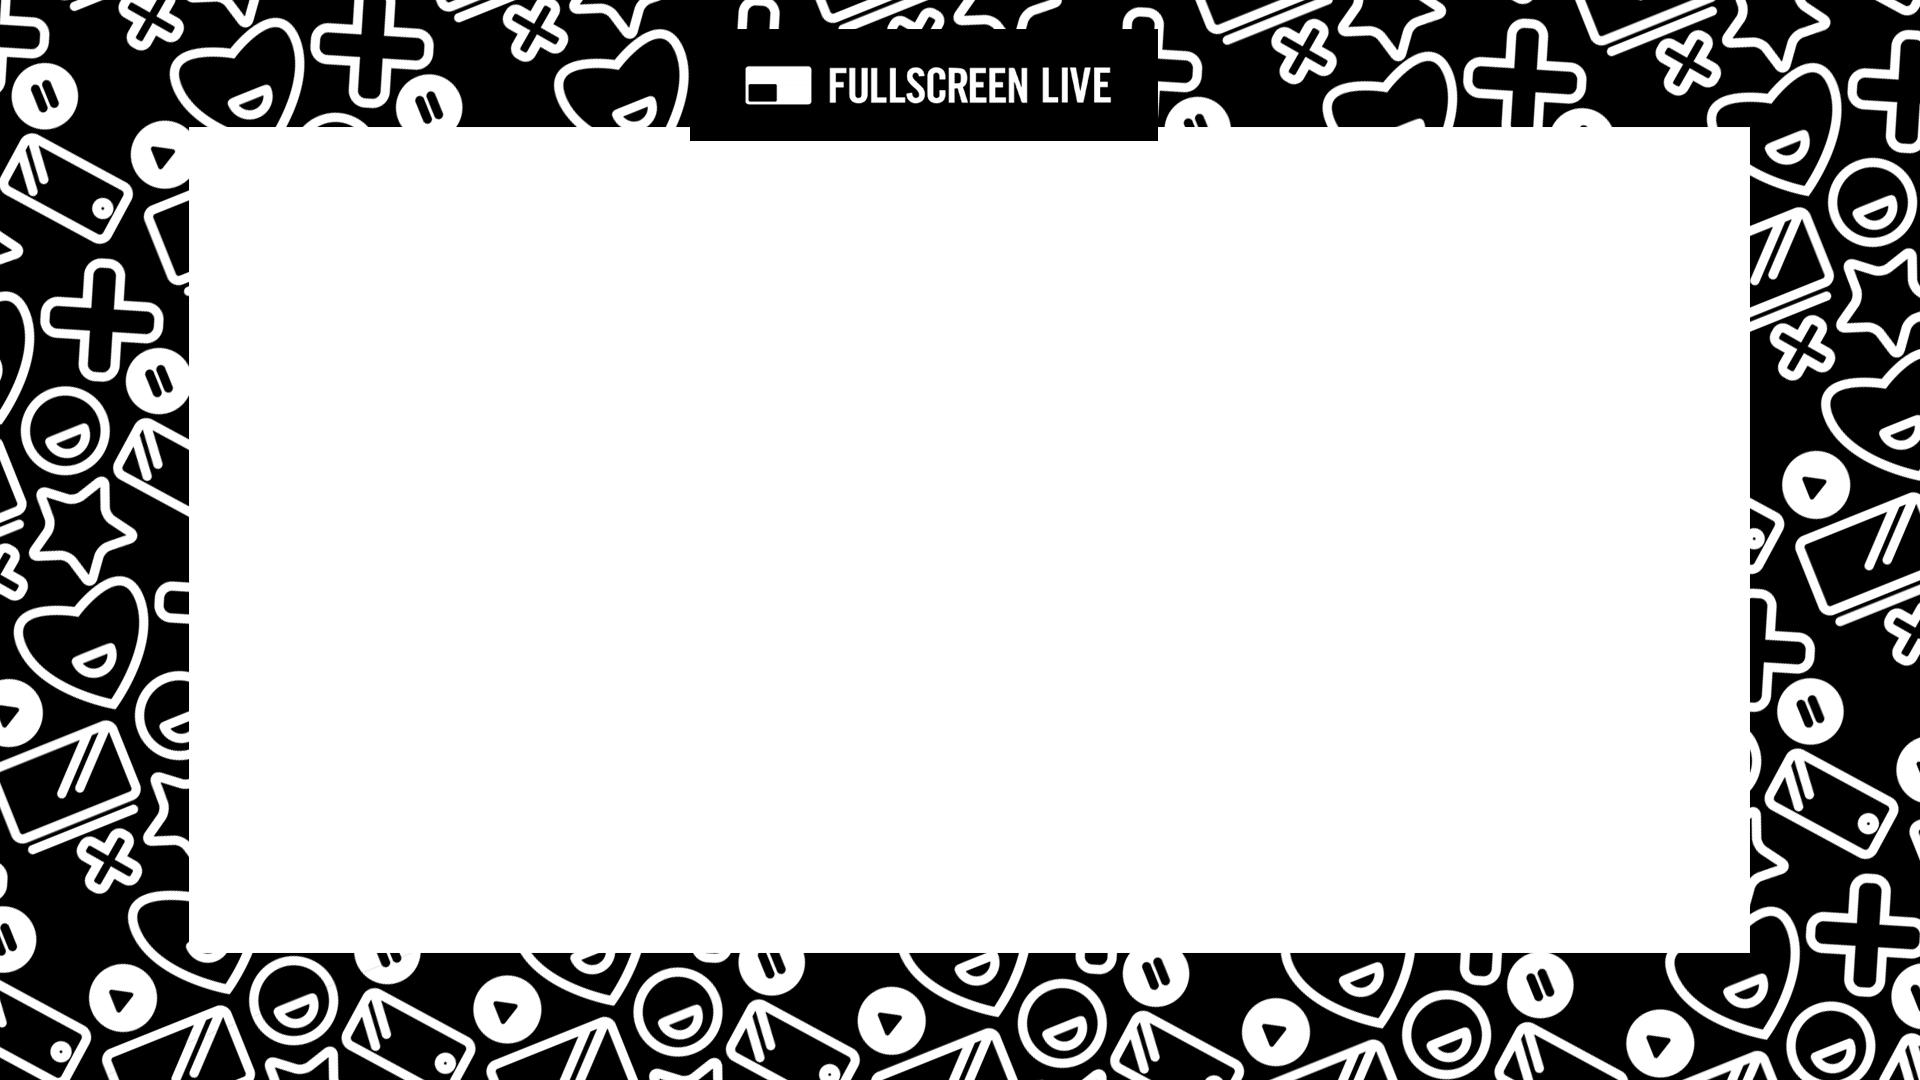 fullscreen_live_keynote_template.png